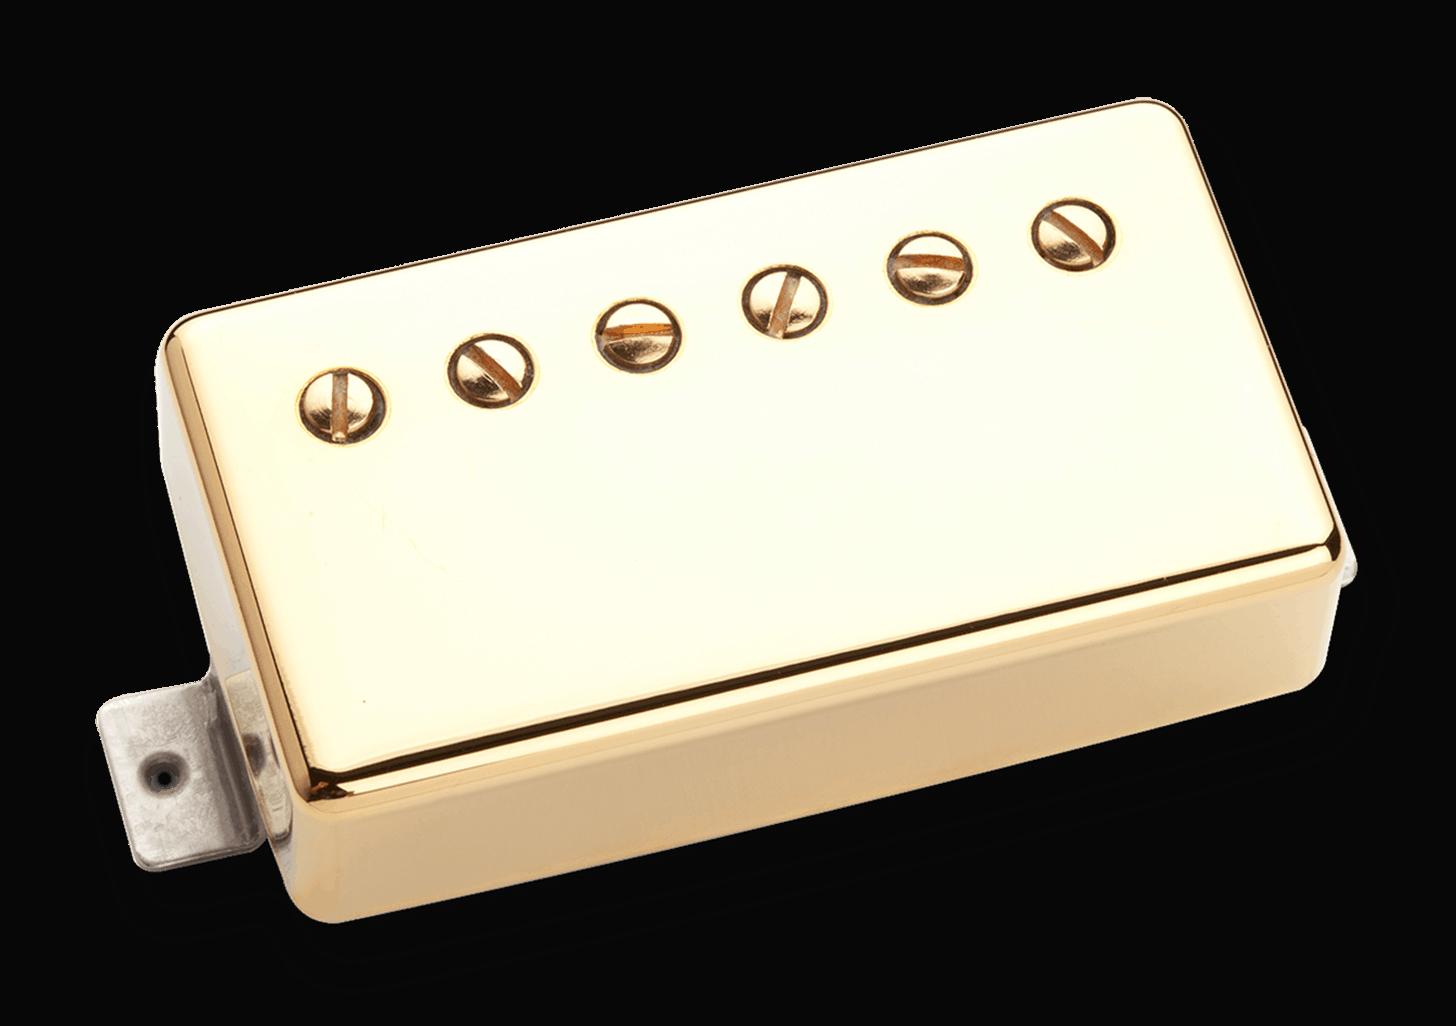 Classic Output Humbucker Pickups 11102 45 GC